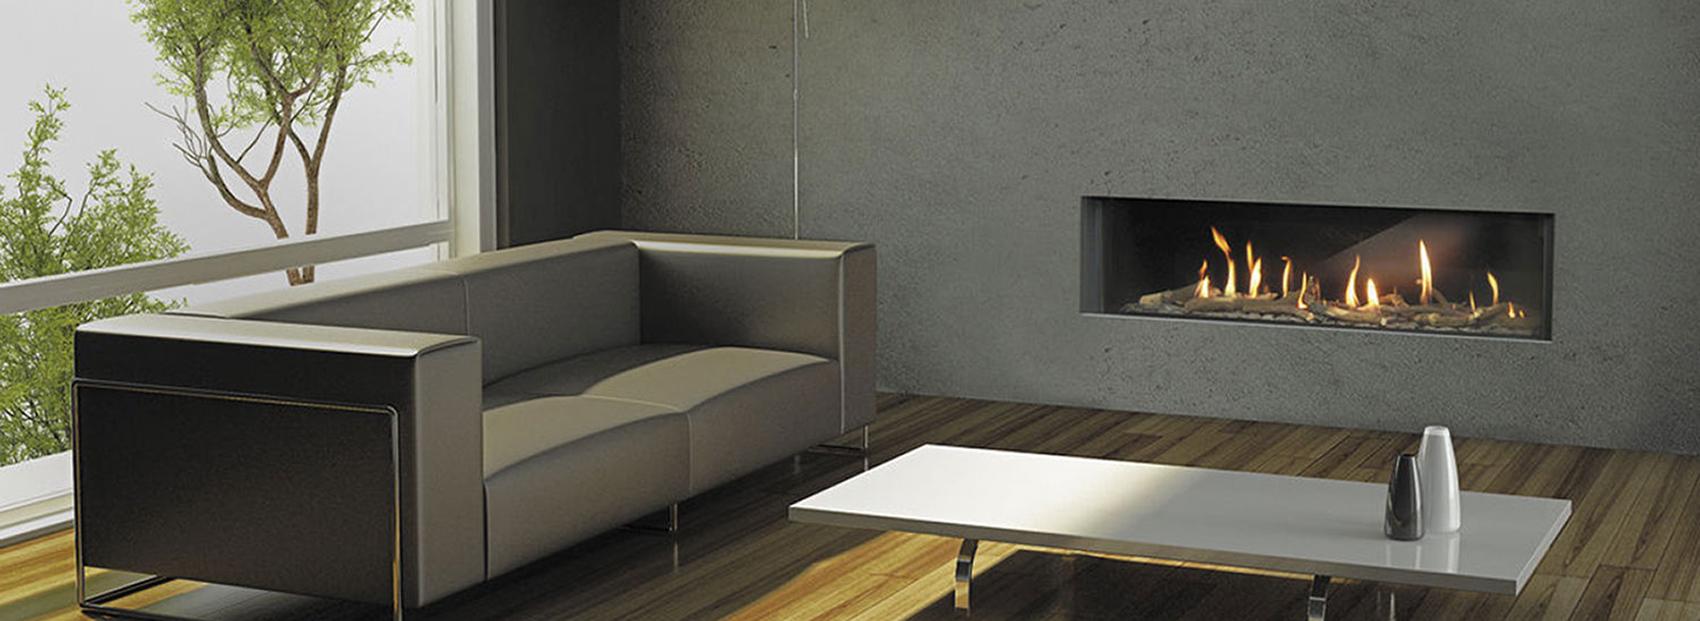 les foyers gaz chemin es jf beignon. Black Bedroom Furniture Sets. Home Design Ideas